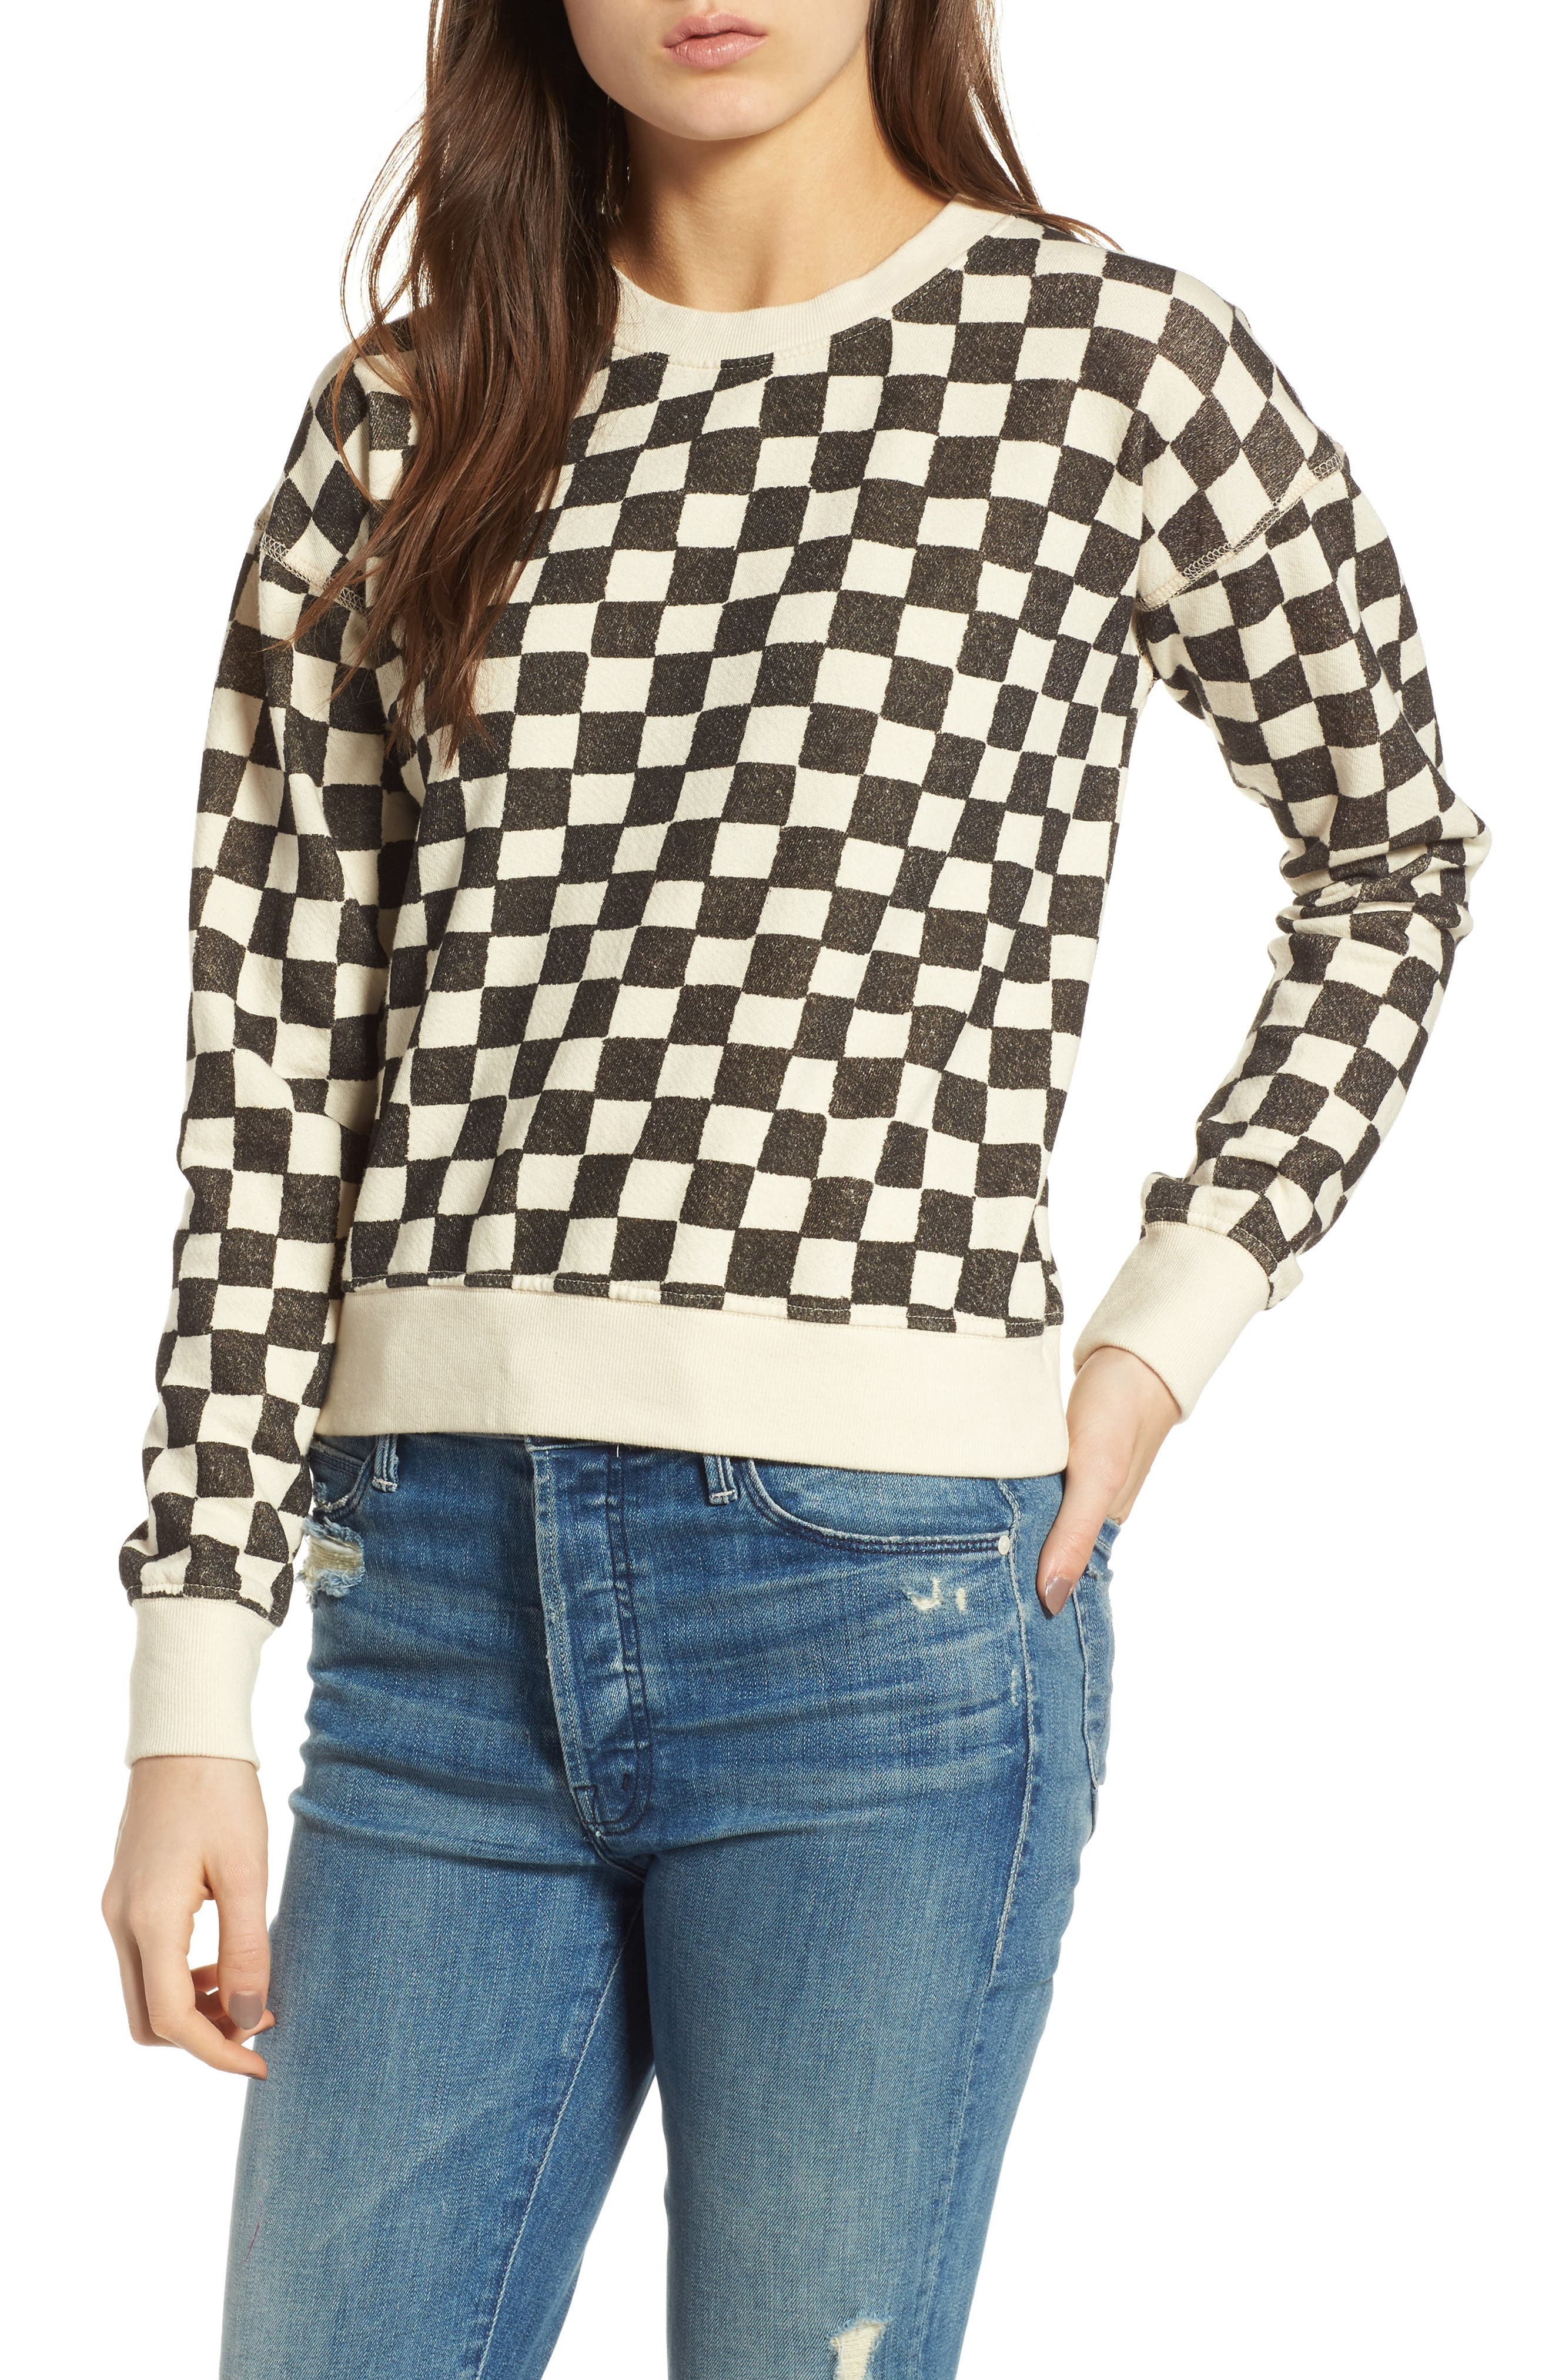 Main Image - MOTHER The Shrunken Sweater